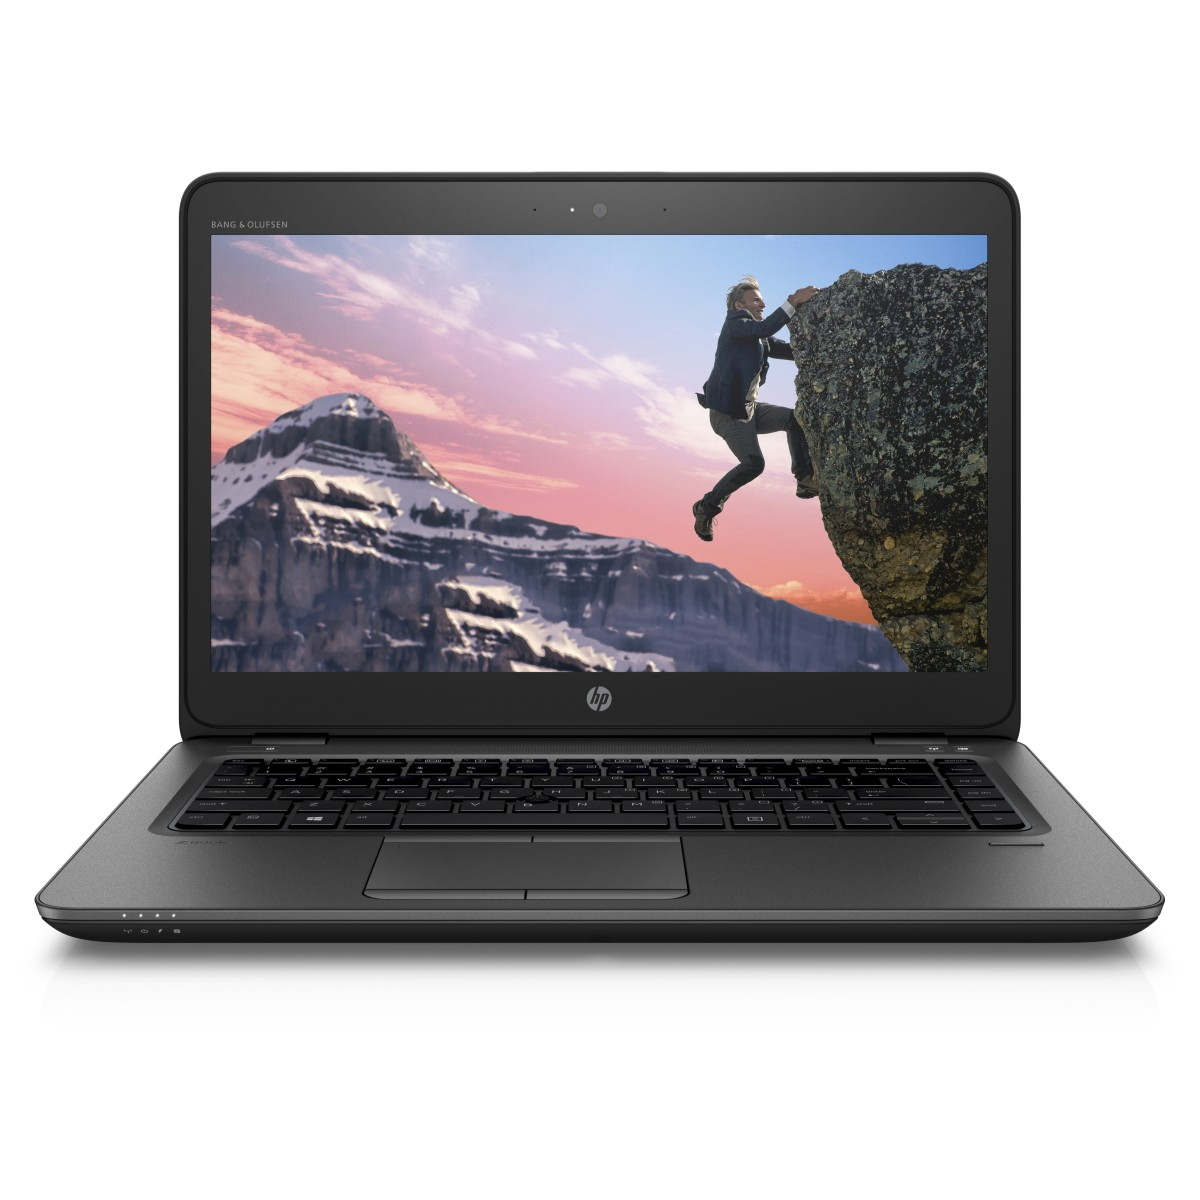 HP Zbook 14u G4, i7-7500U, 14.0 FHD, AMD Firepro W4190/2GB, 16GB, 512GB Turbo Drive G2 m.2 NVME MLC, ac + BT, WPro10, 3y